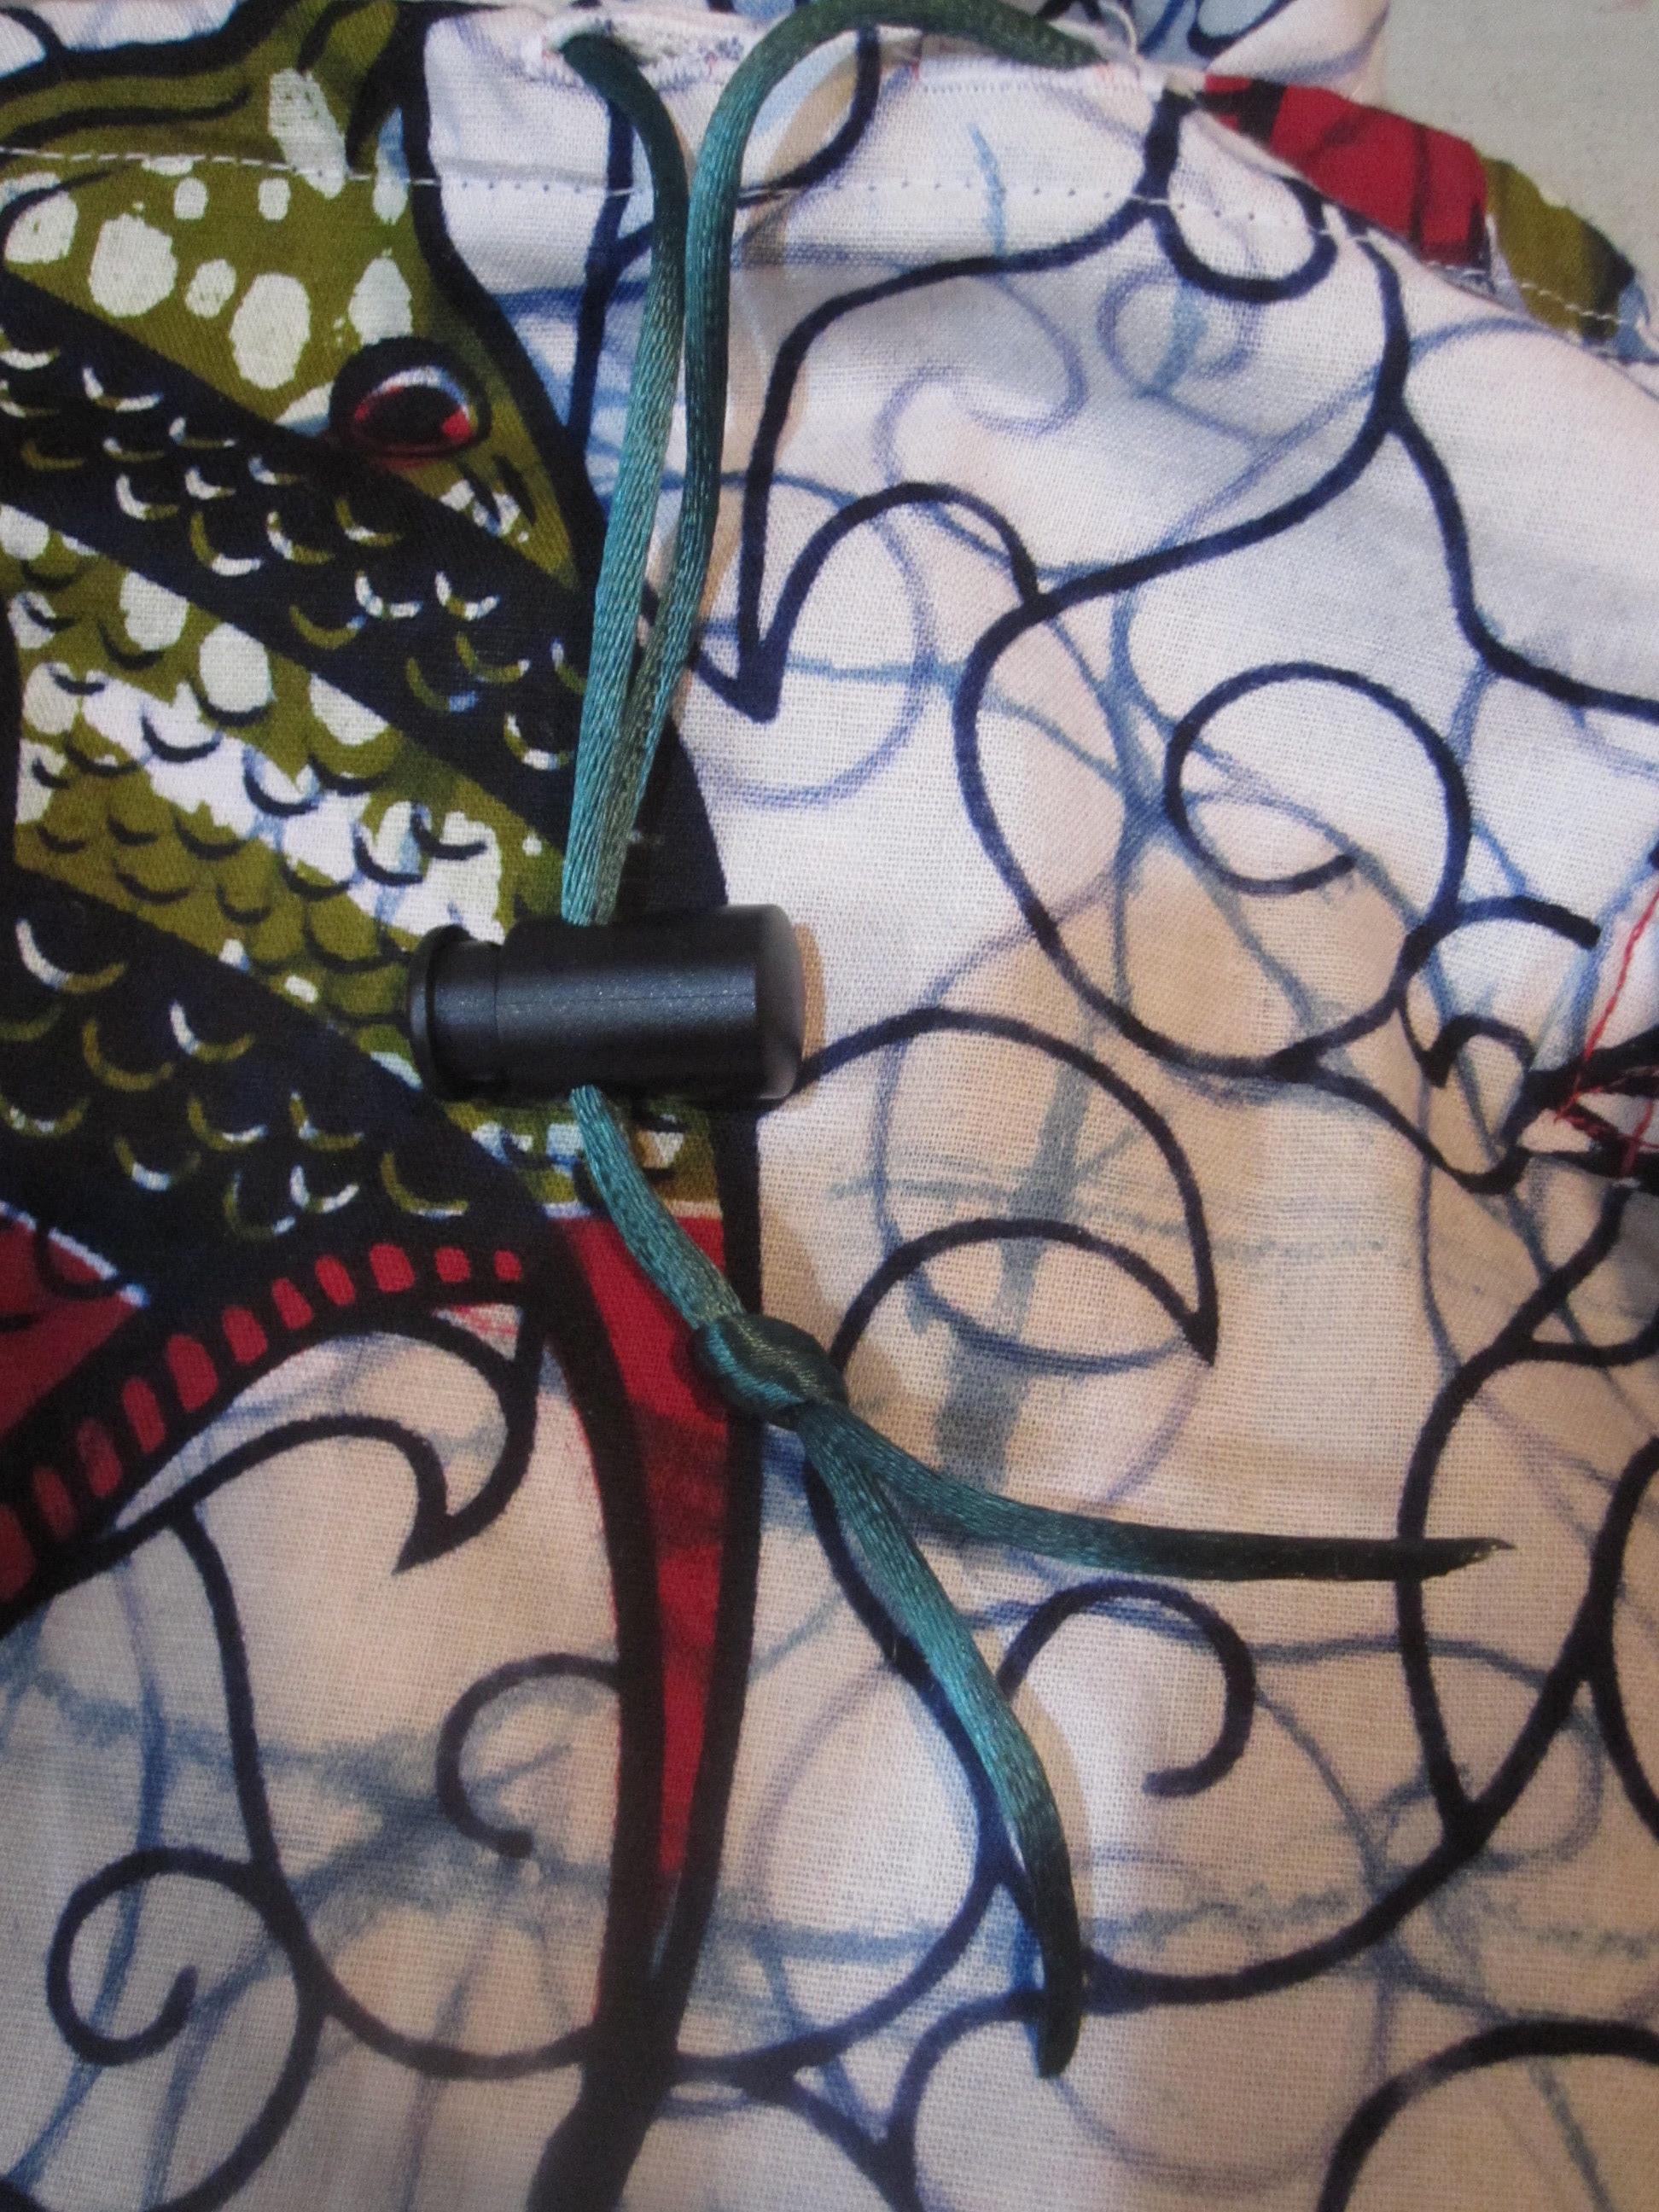 Knot Drawstring Below Cord Stop